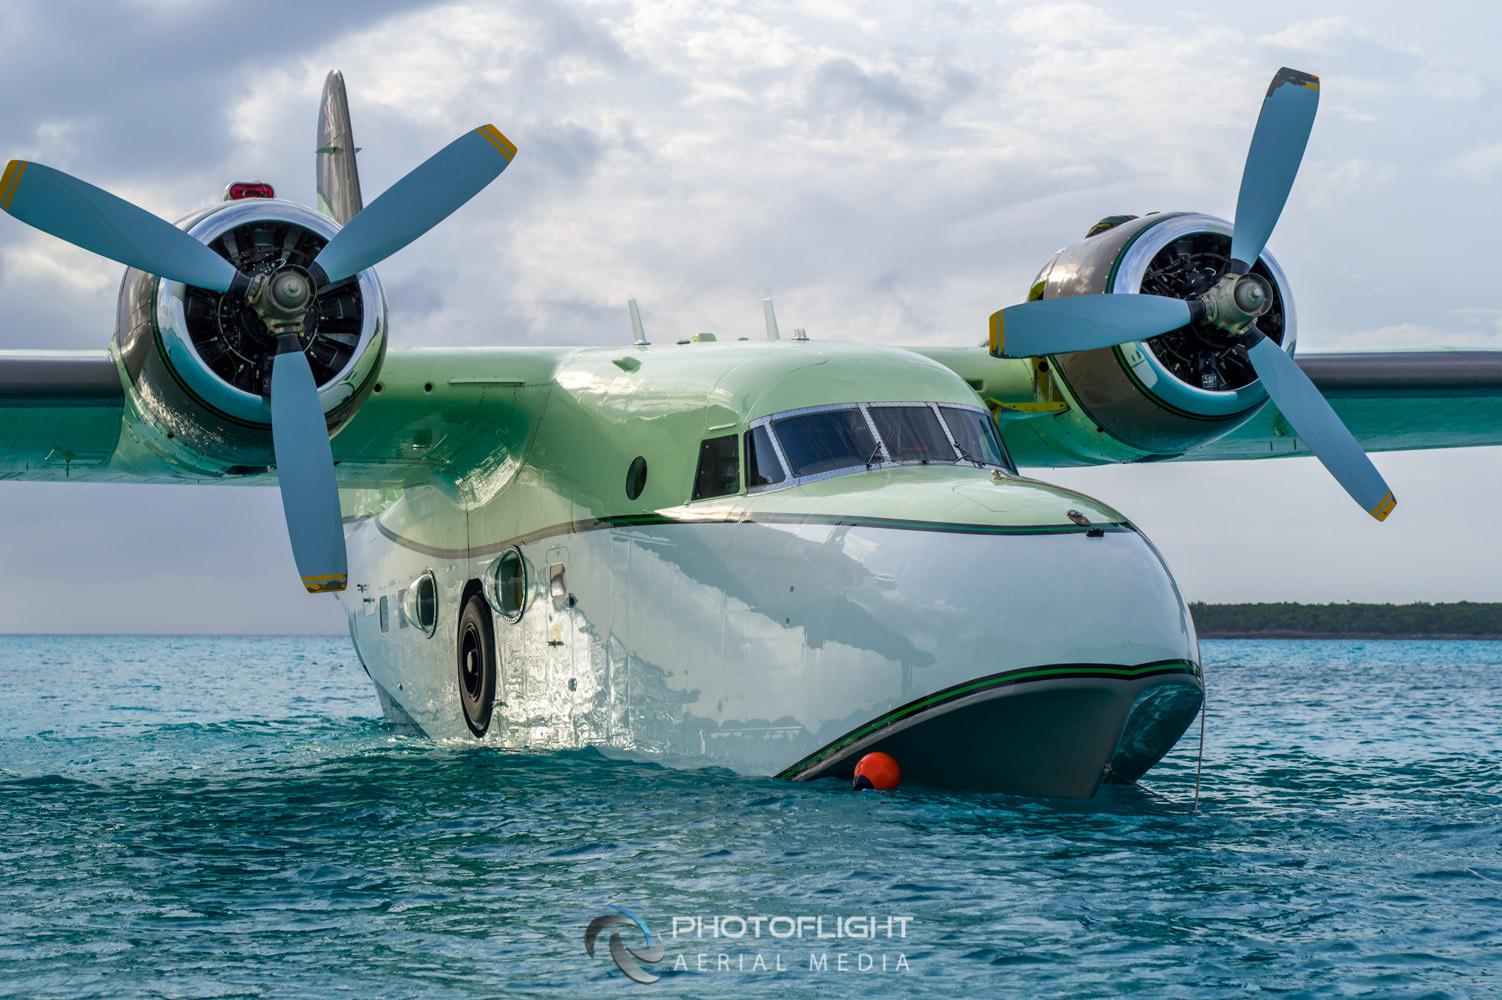 Flying Boat Film Bahamas, PhotoFlight Aerial Media, professional drone photography